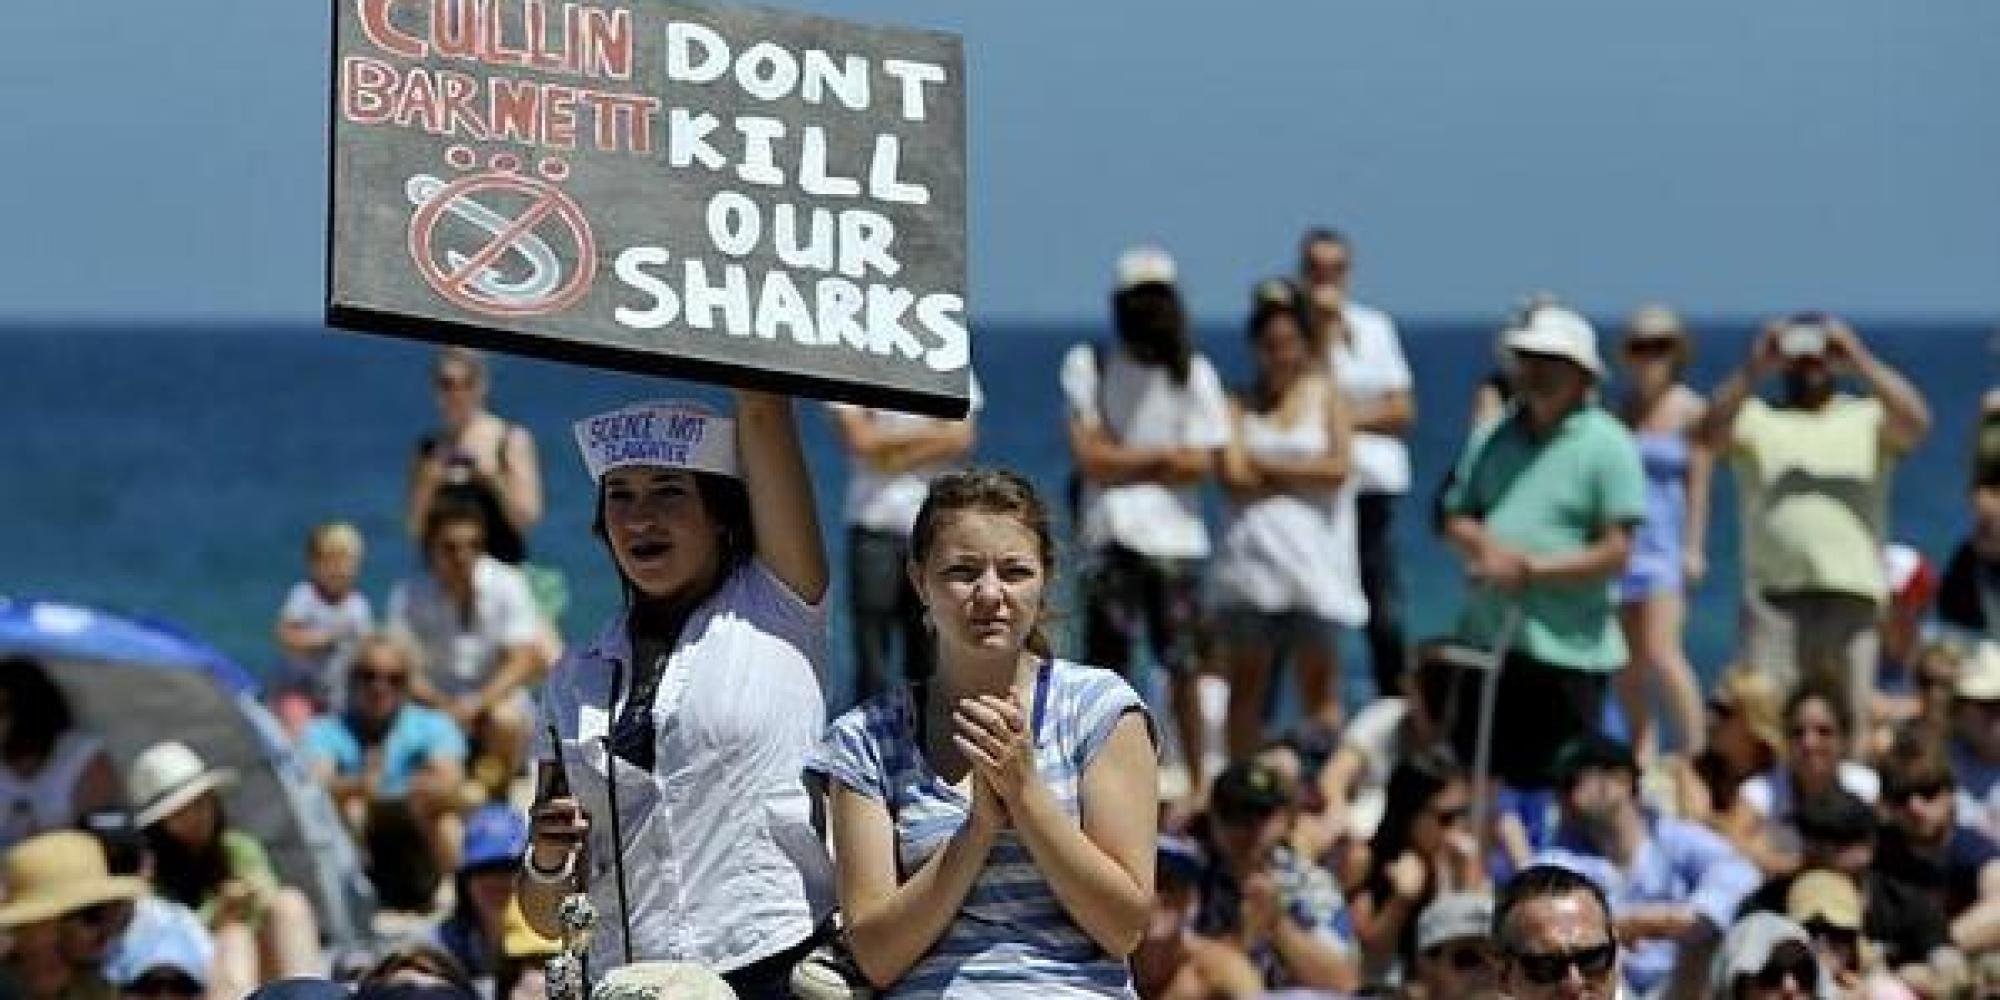 Western Australia Shark Cull Shark Cull in Western